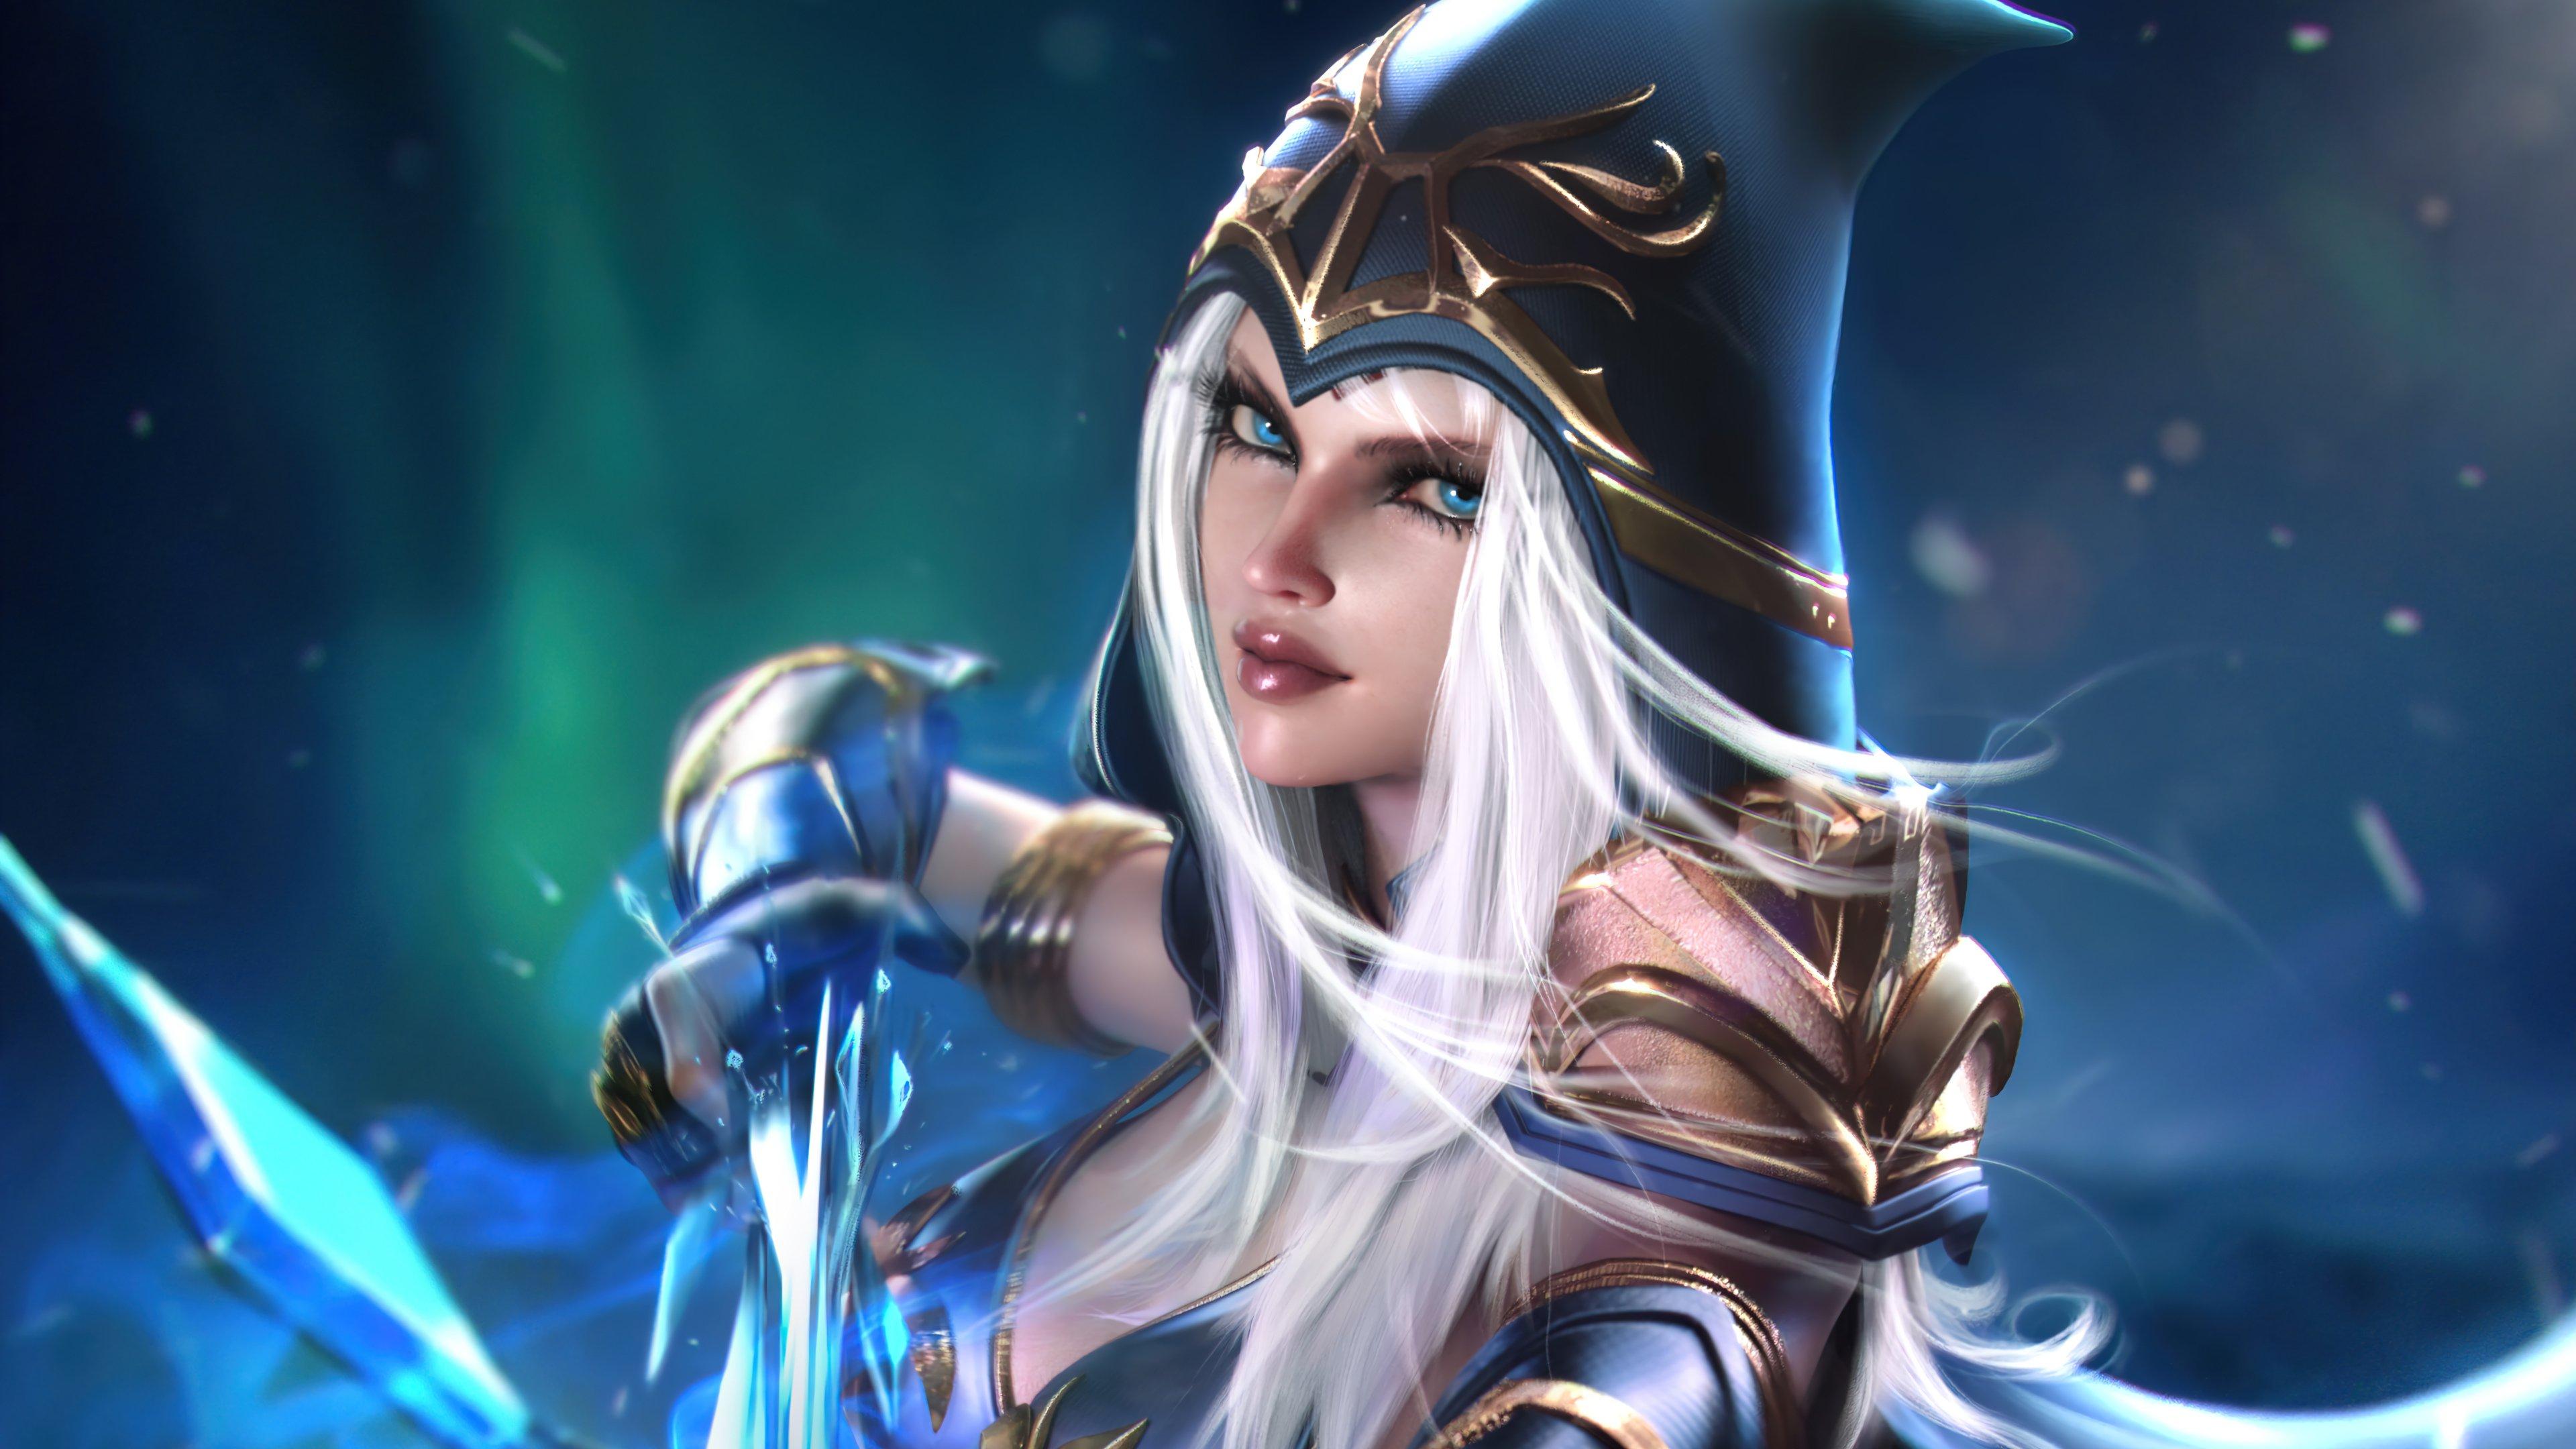 Wallpaper Ashe League of Legends